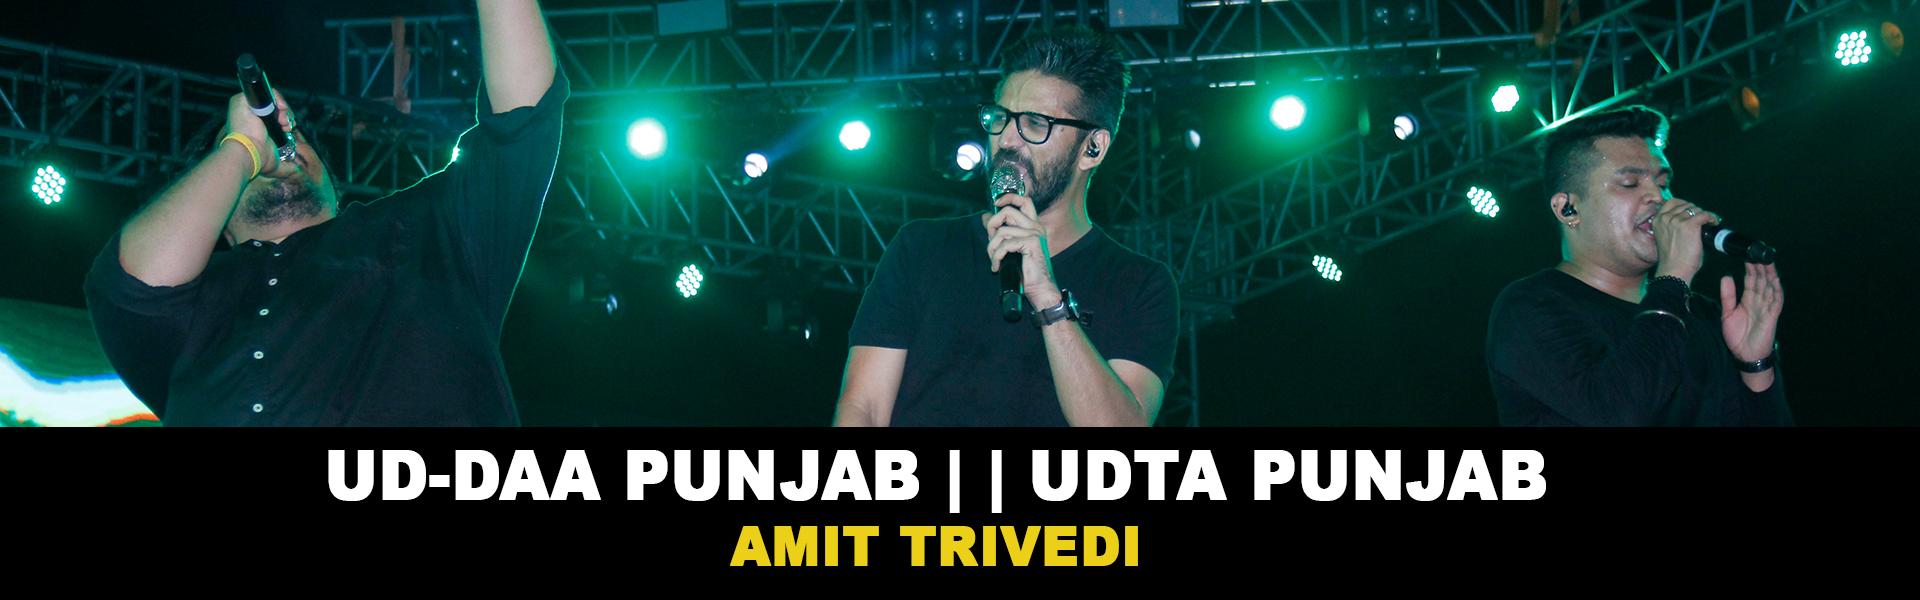 Udta Punjab | Amit Trivedi | MAD FEST | Bhubaneswar